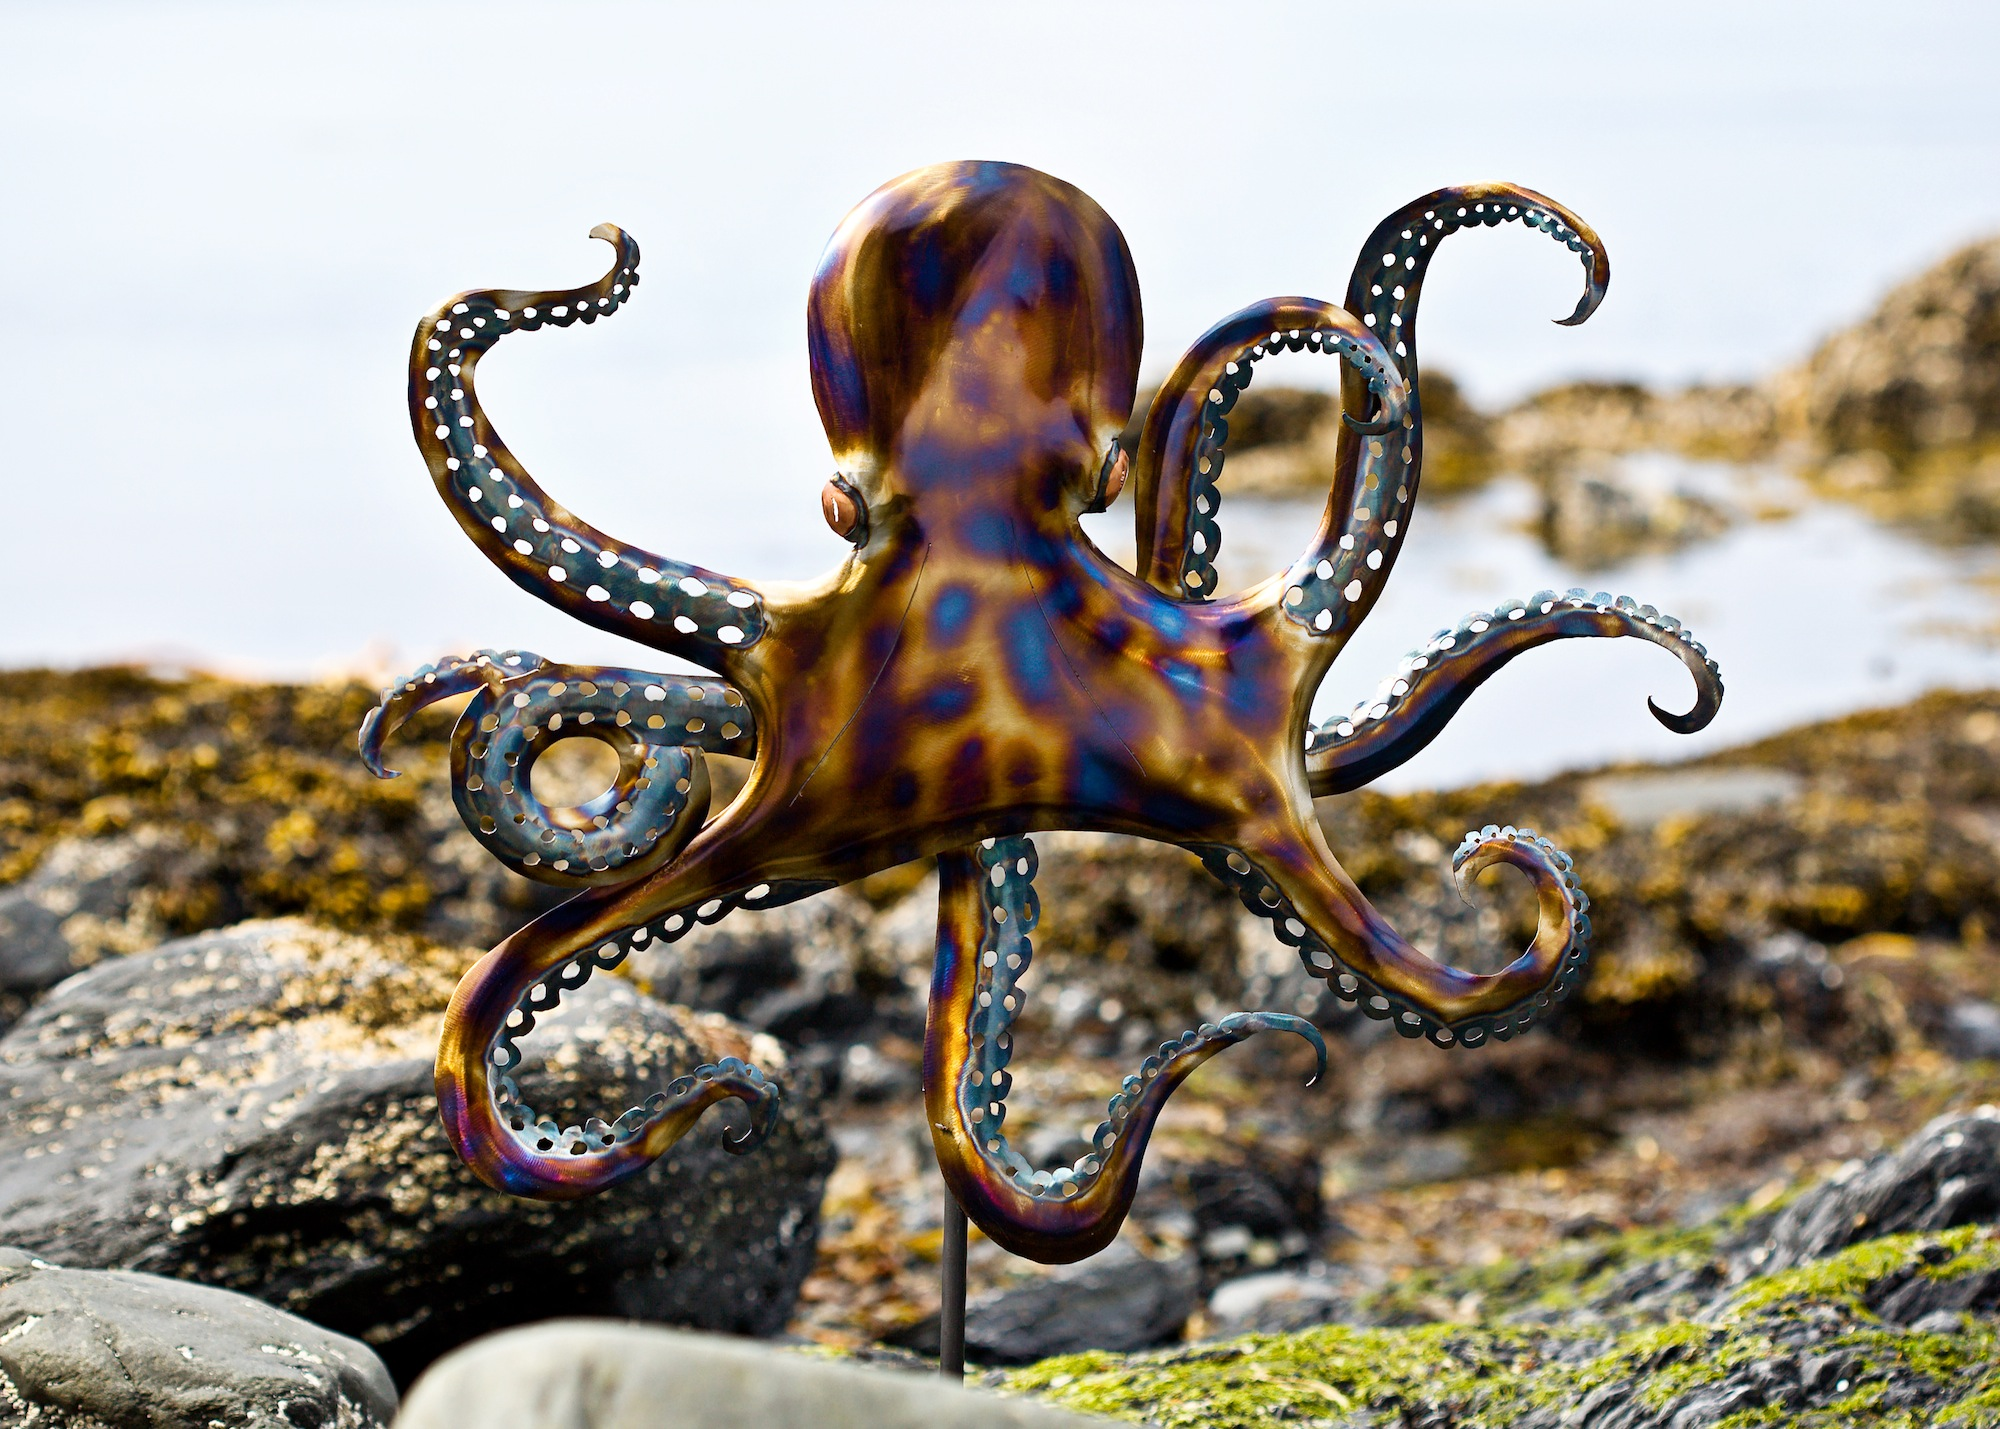 Steel Rearing Octopus